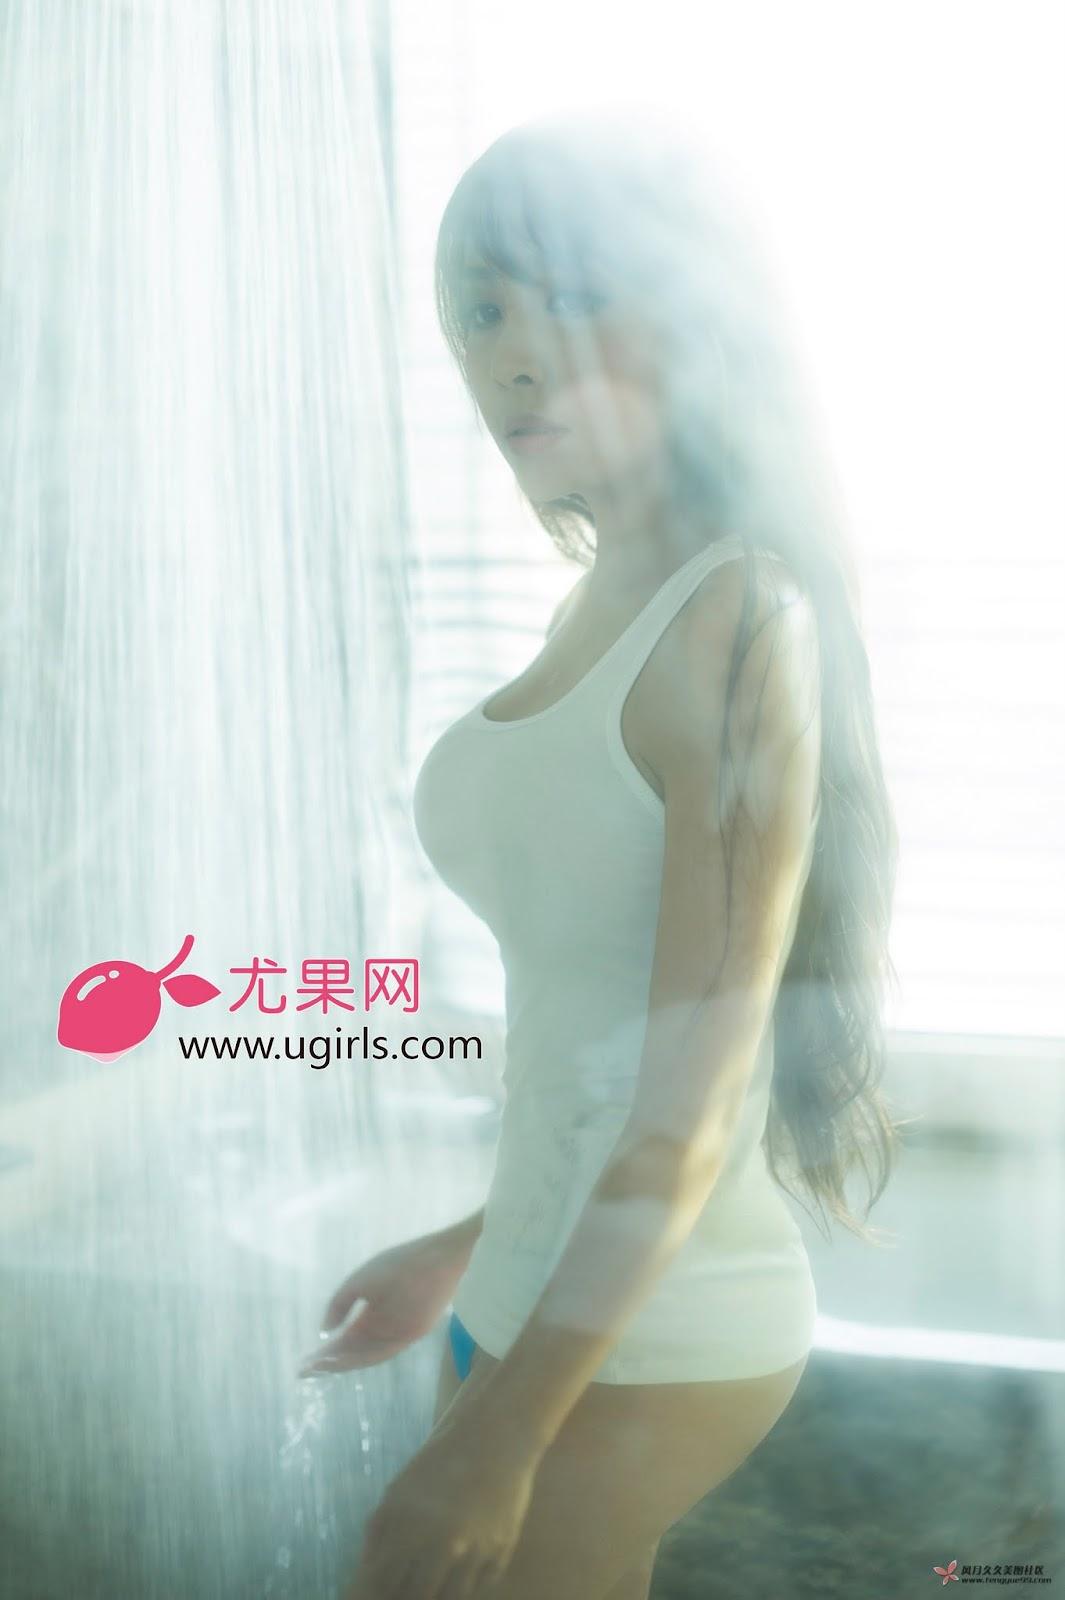 DLS 4869 - Hot Girl Model UGIRLS NO.13